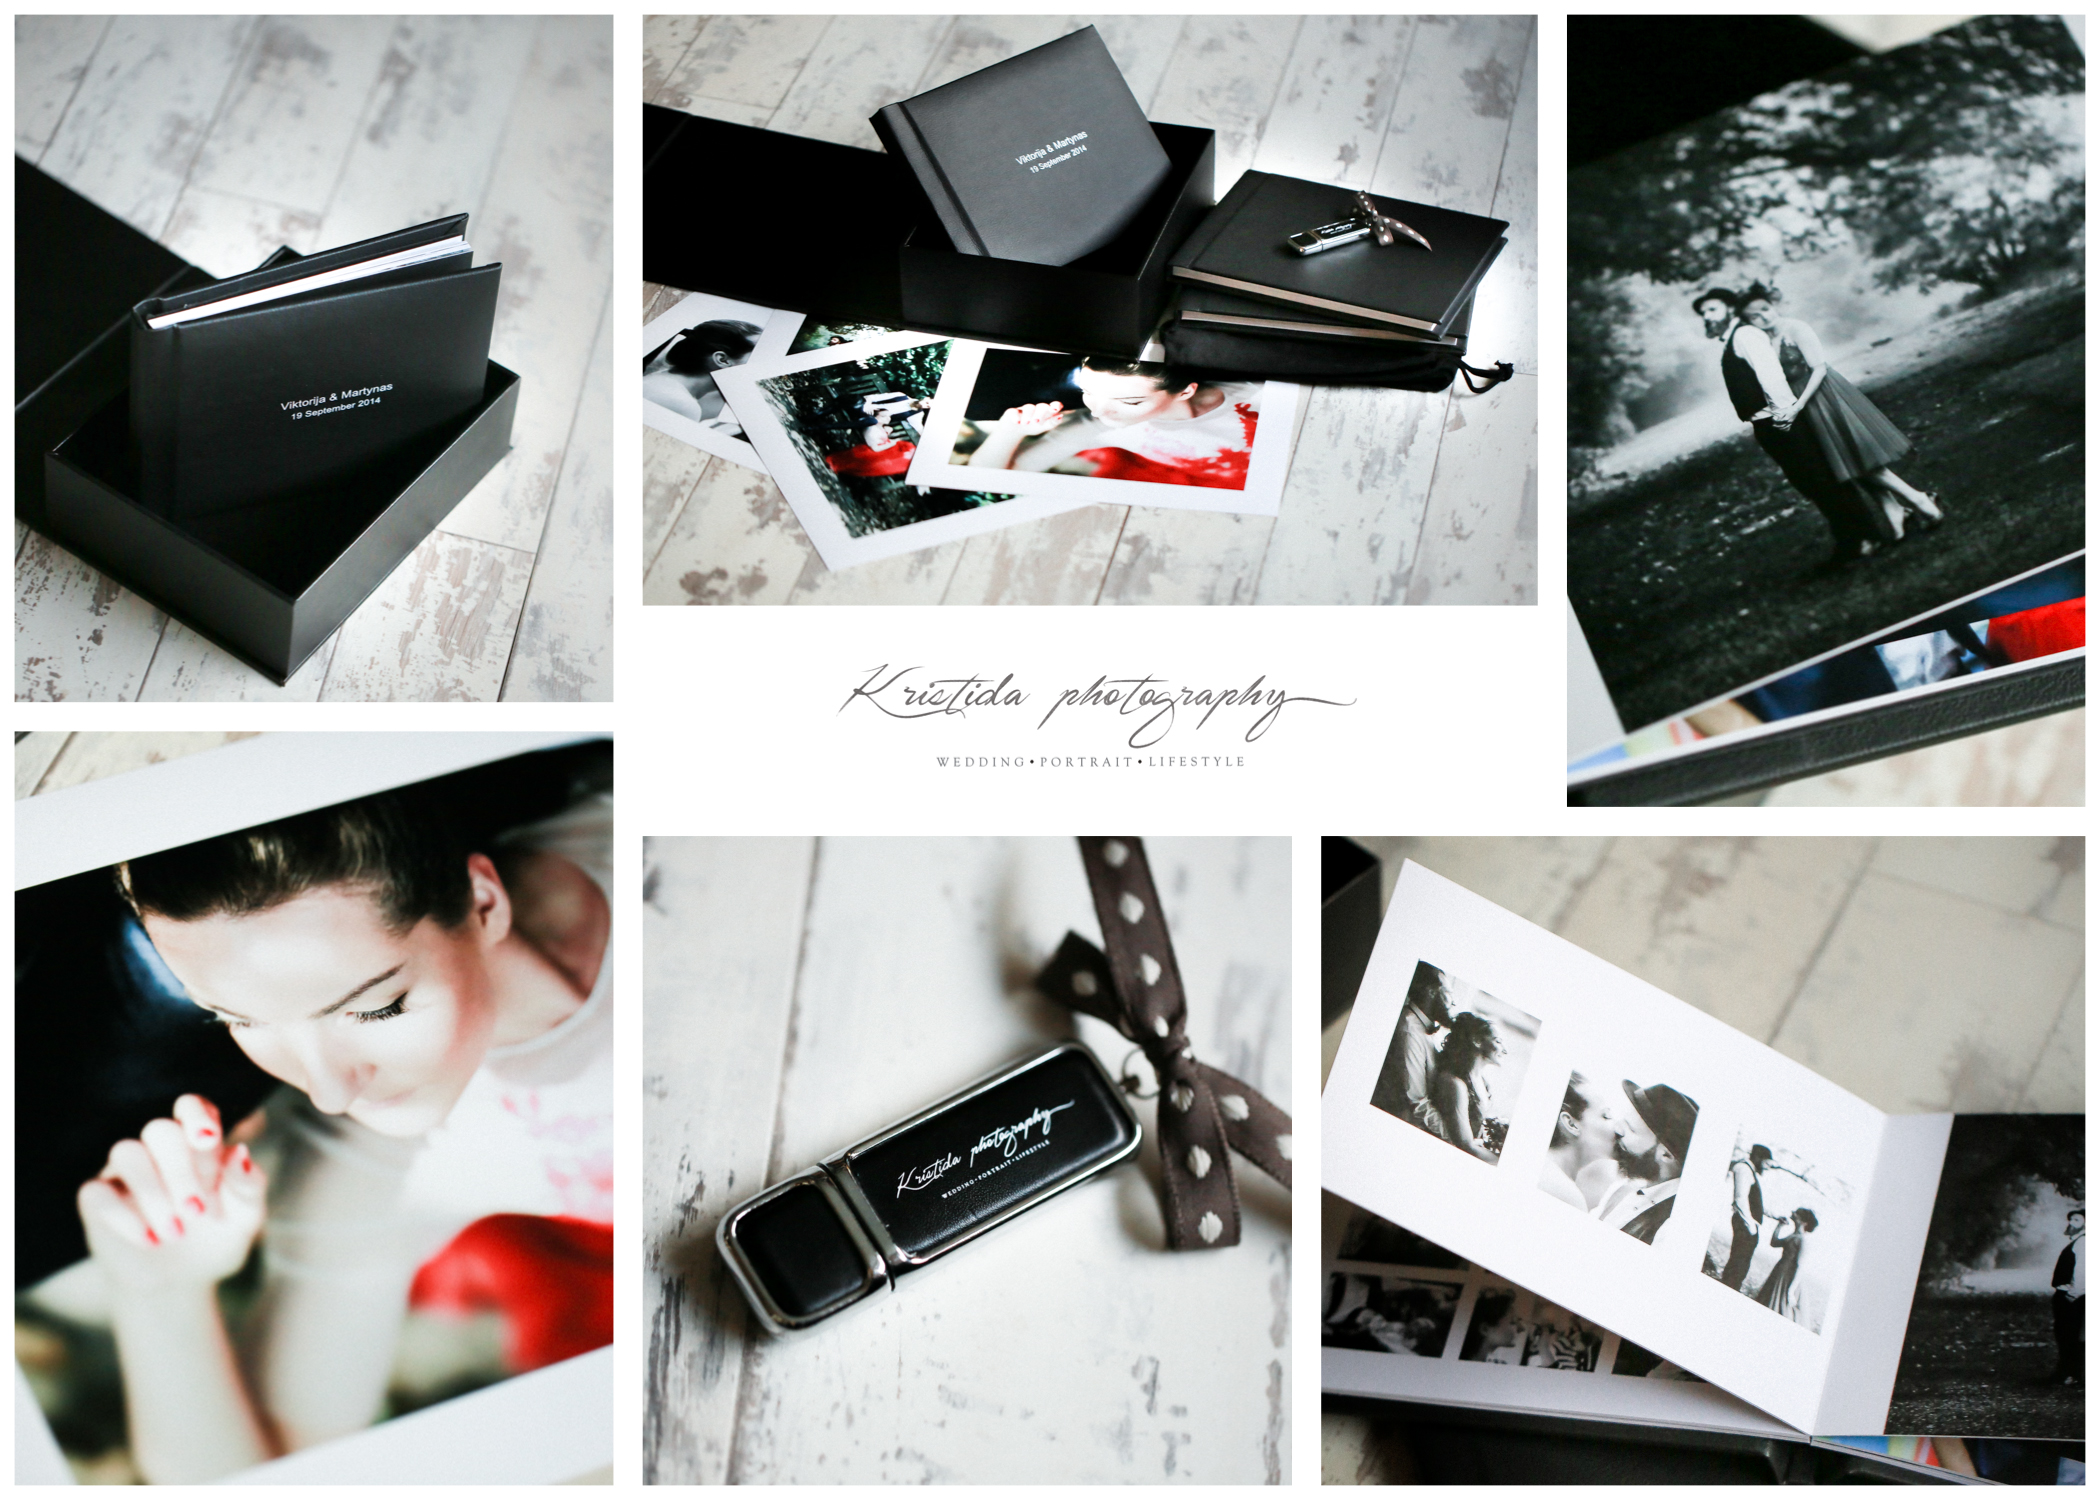 Wedding Photographer London |Kristida Photography